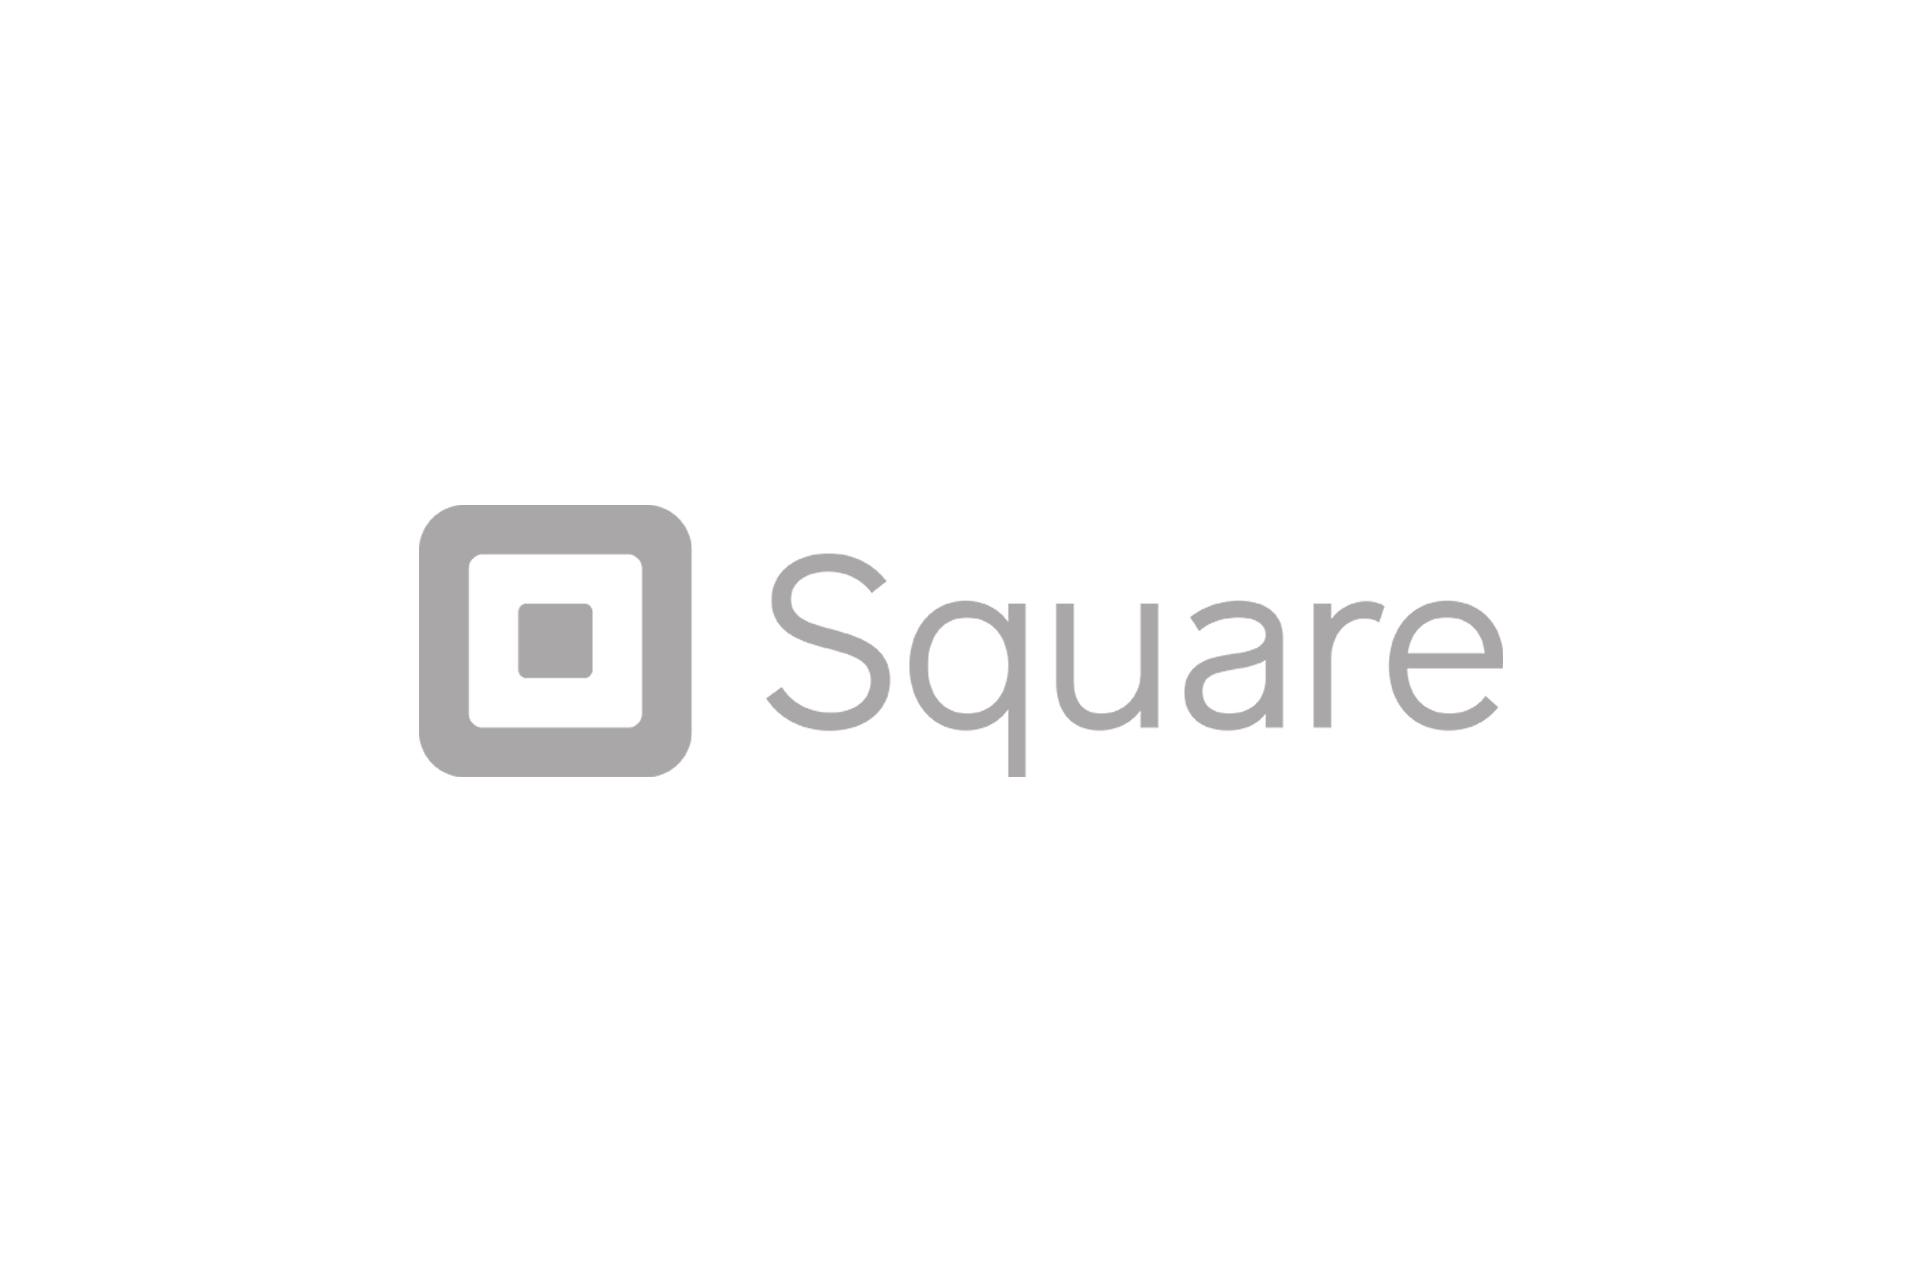 square logo grey